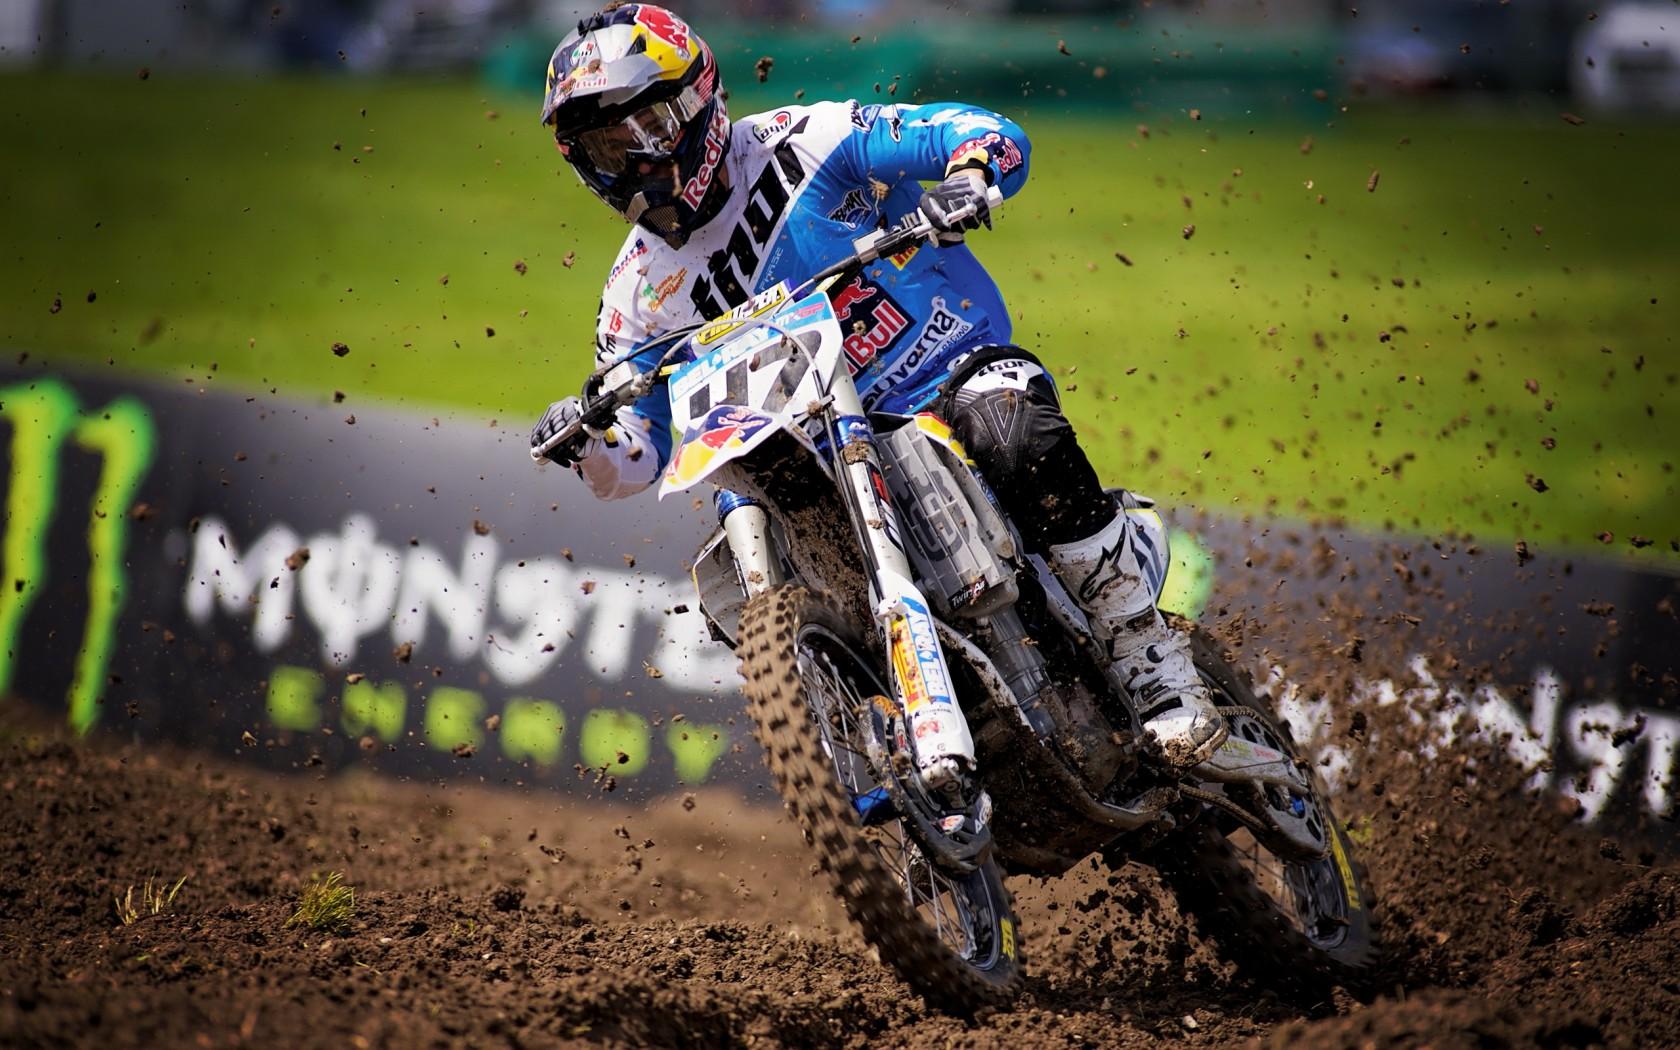 wallpaper : sports, motorcyclist, race, motorsport, extreme sport